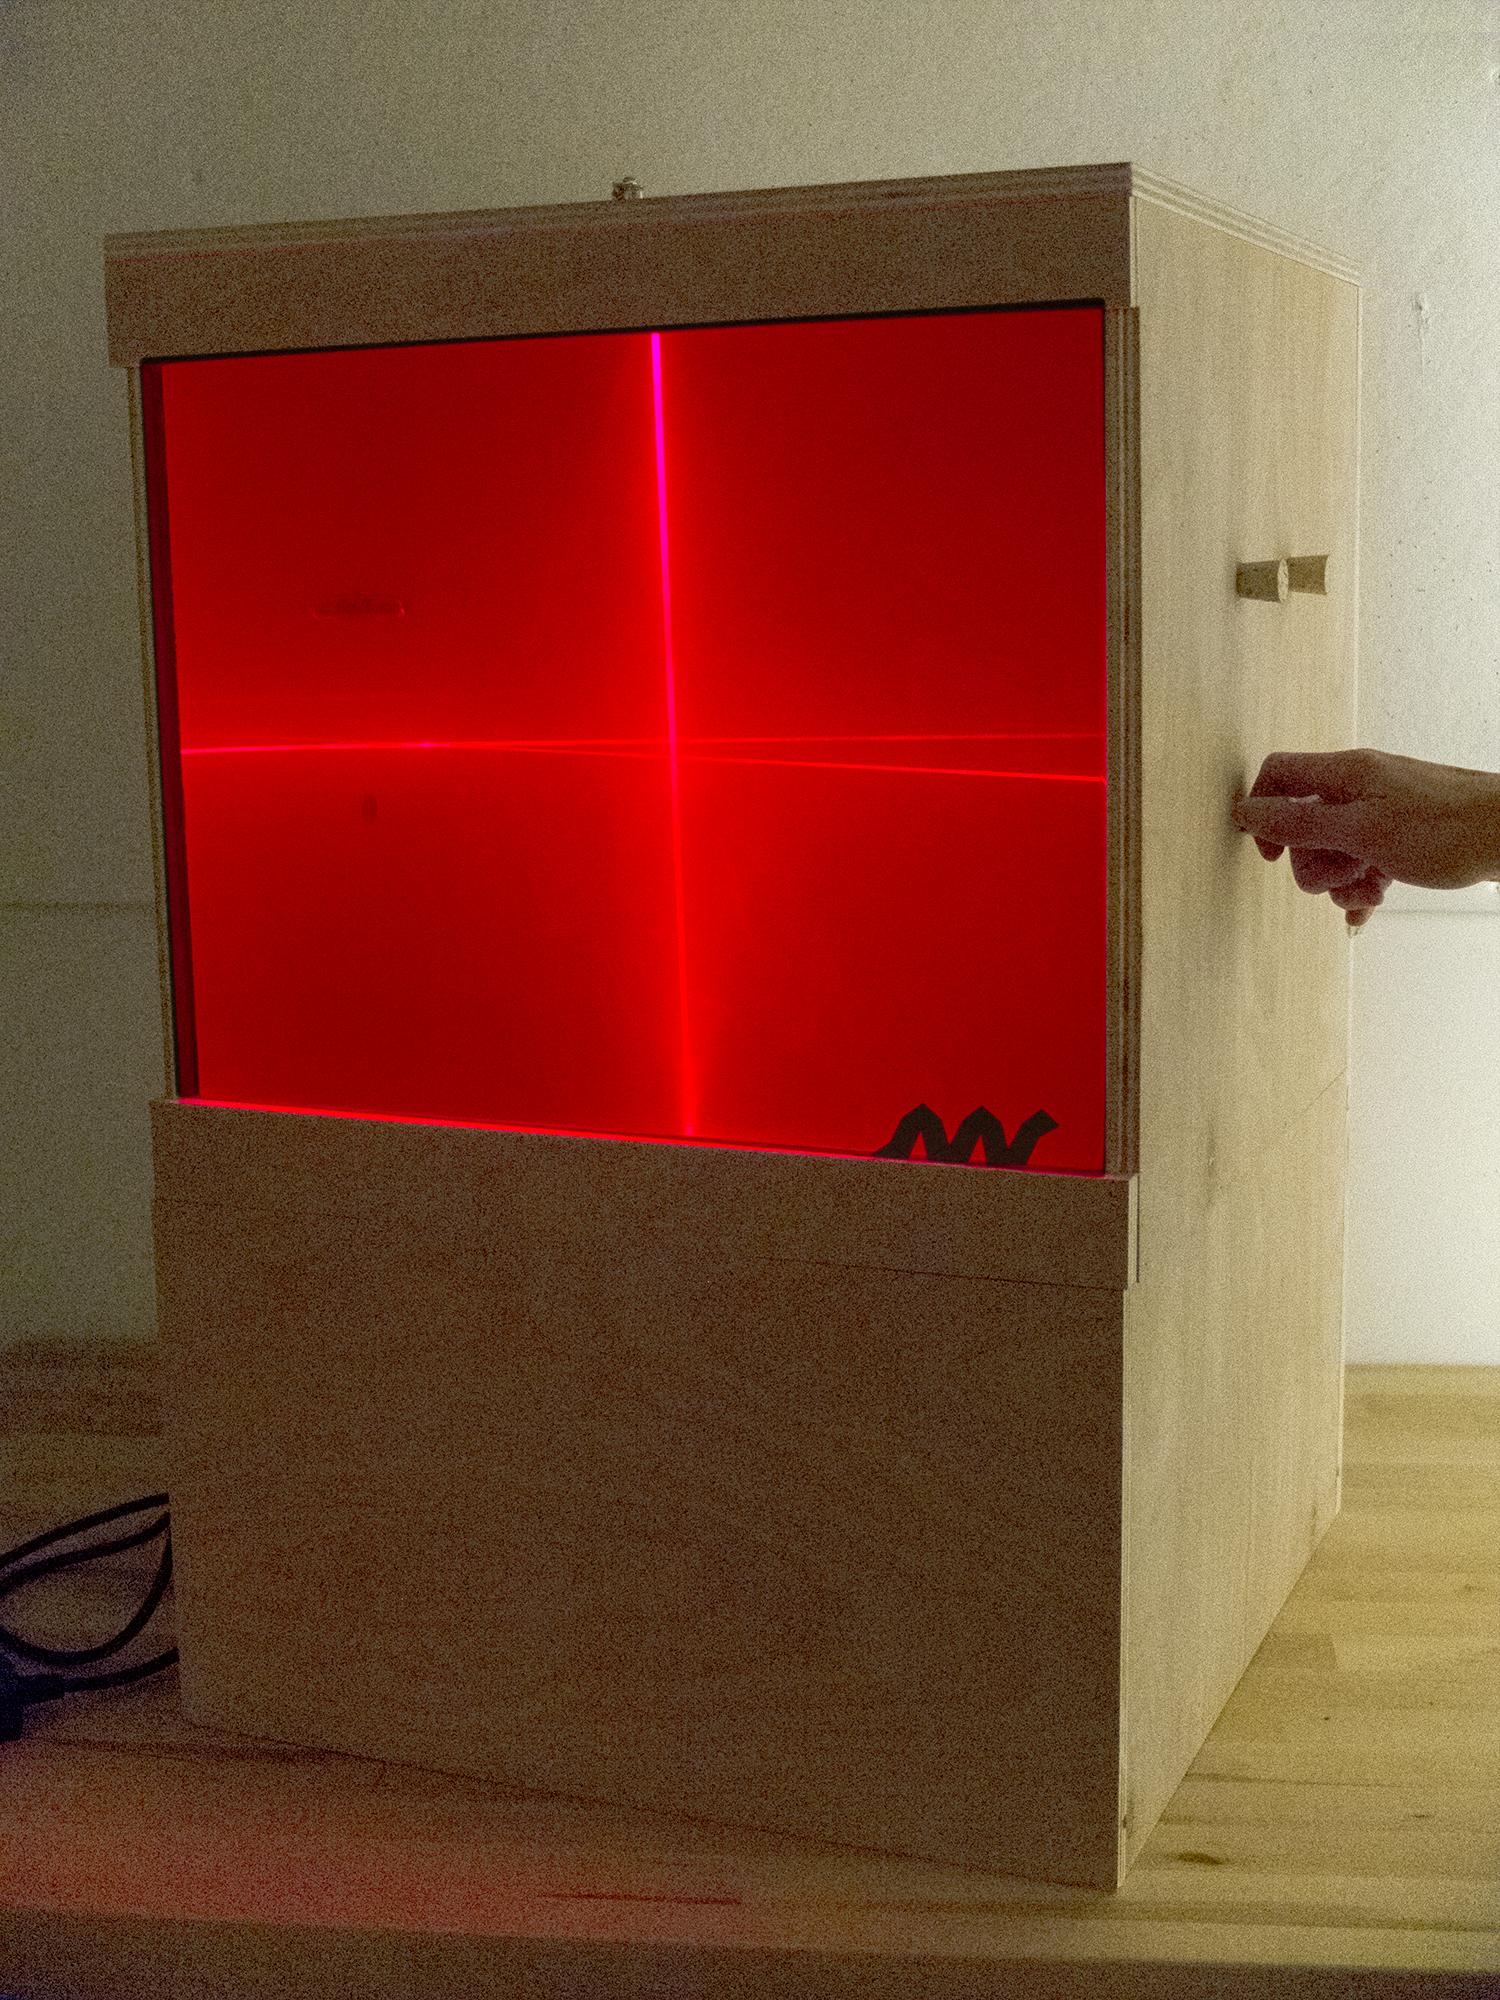 LaserBoxInProgressWithHand.jpg